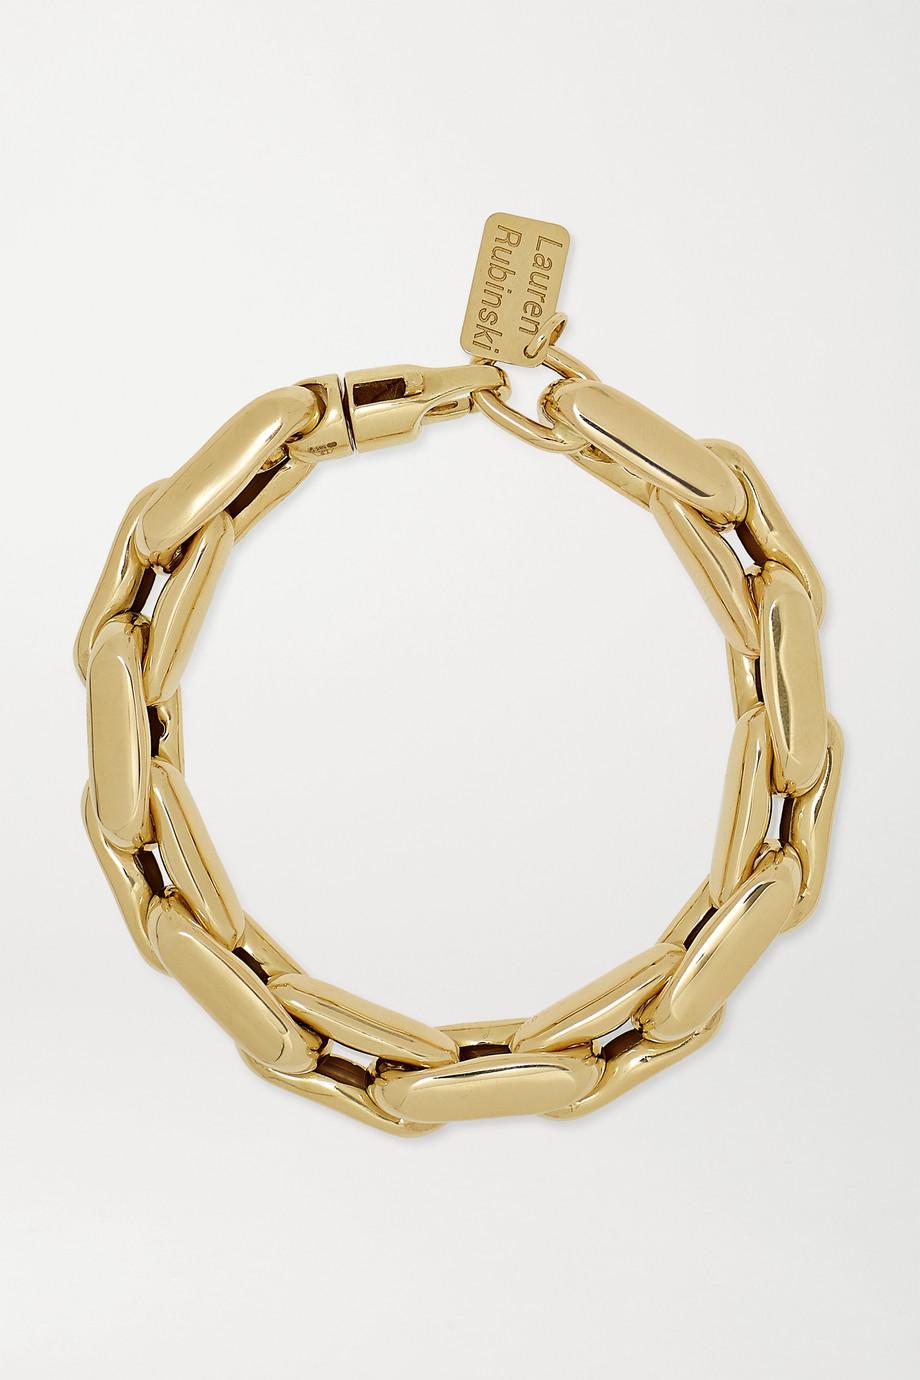 Lauren Rubinski 14-karat gold bracelet